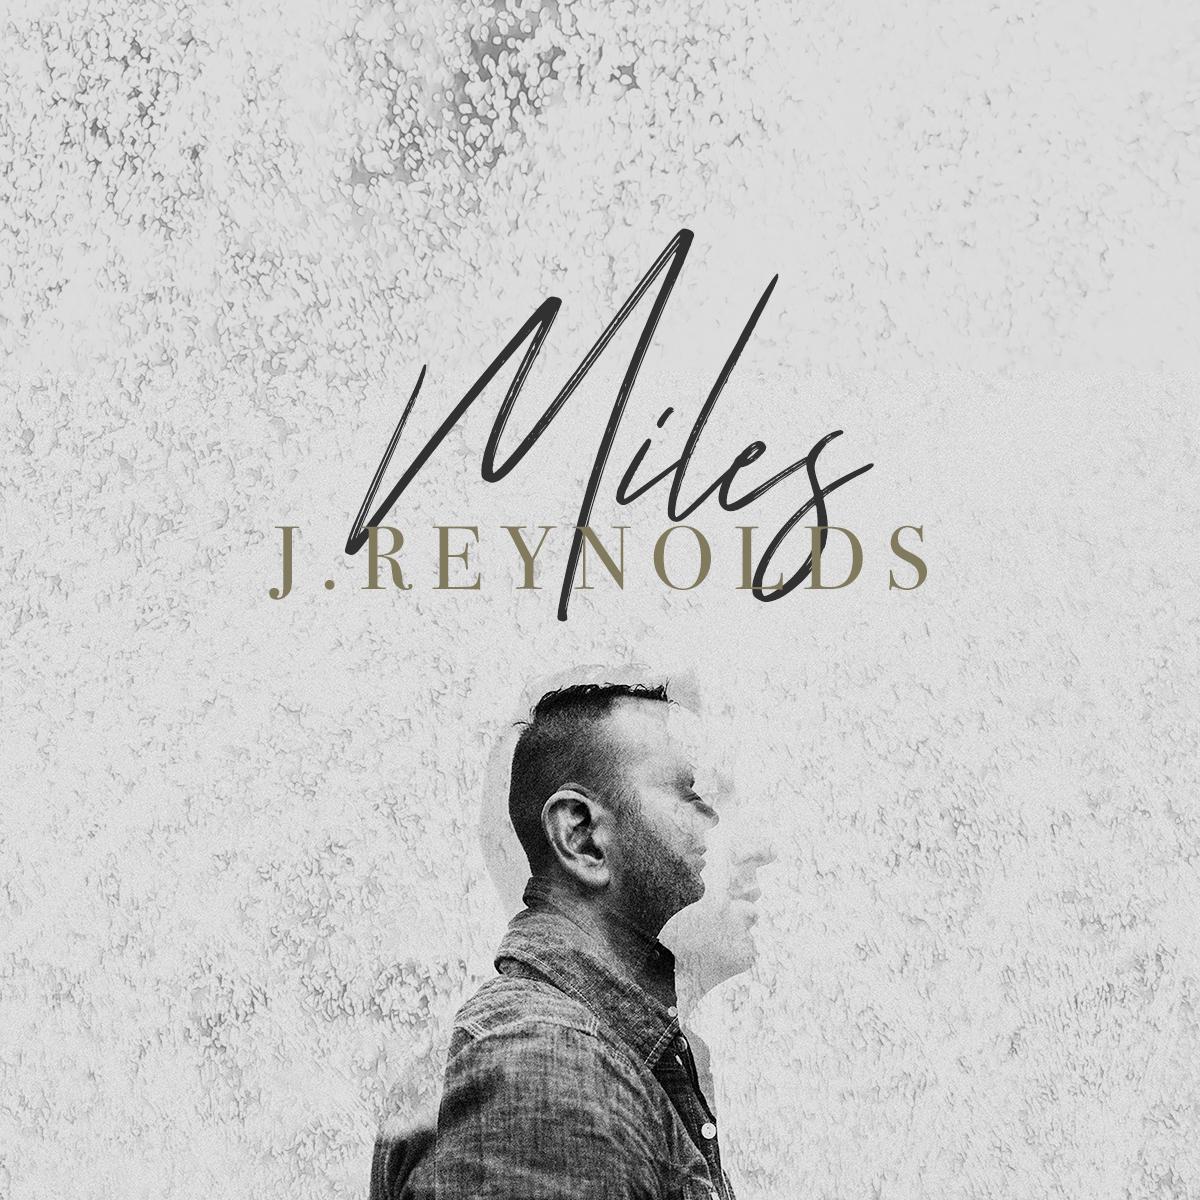 J. Reynolds / Miles